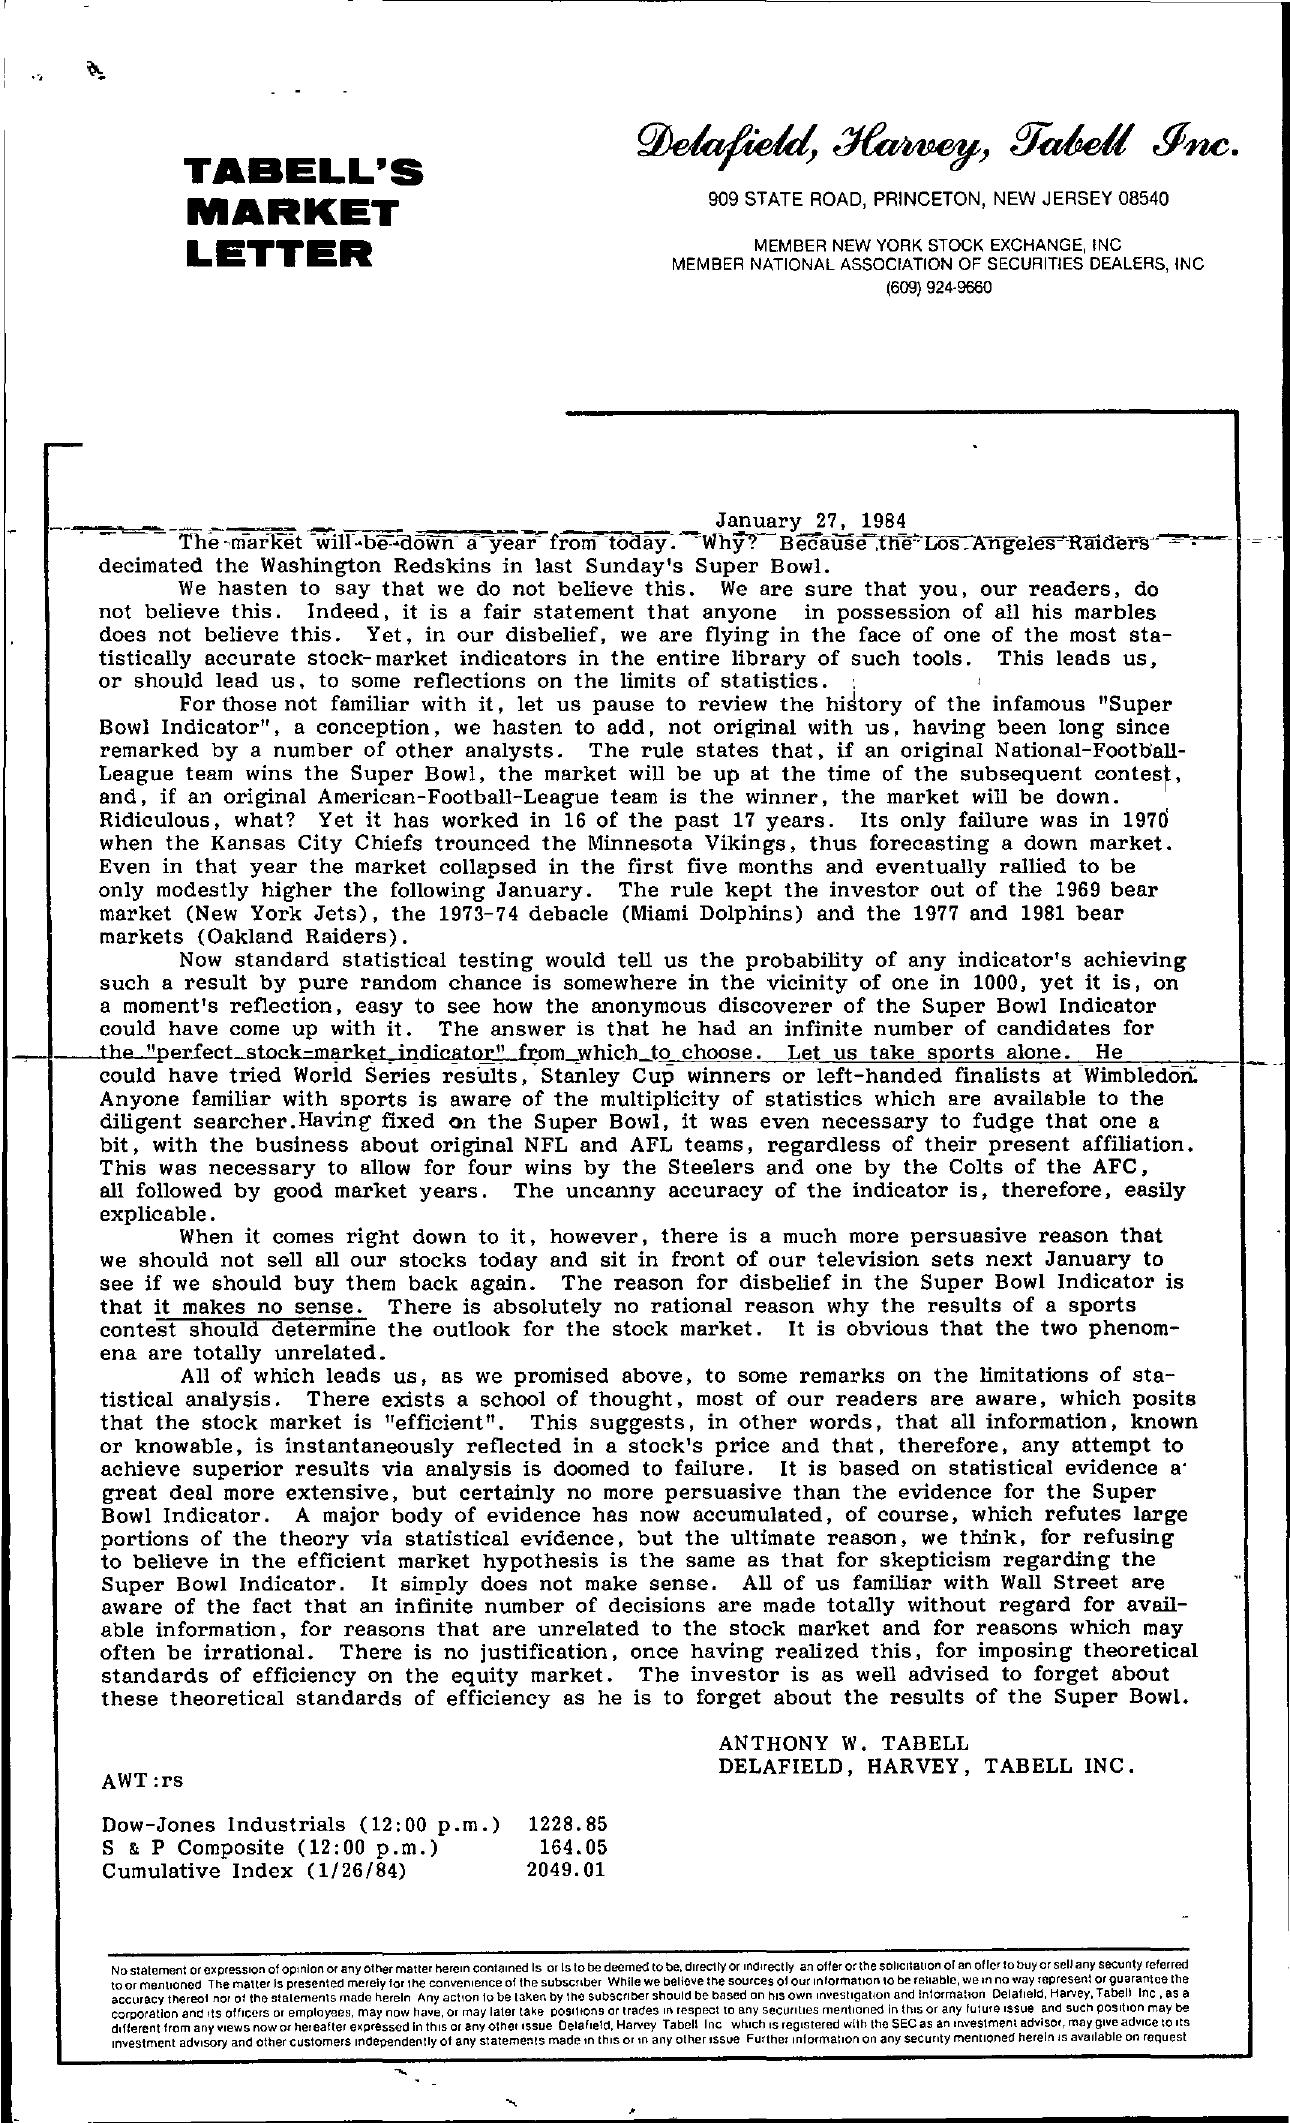 Tabell's Market Letter - January 27, 1984